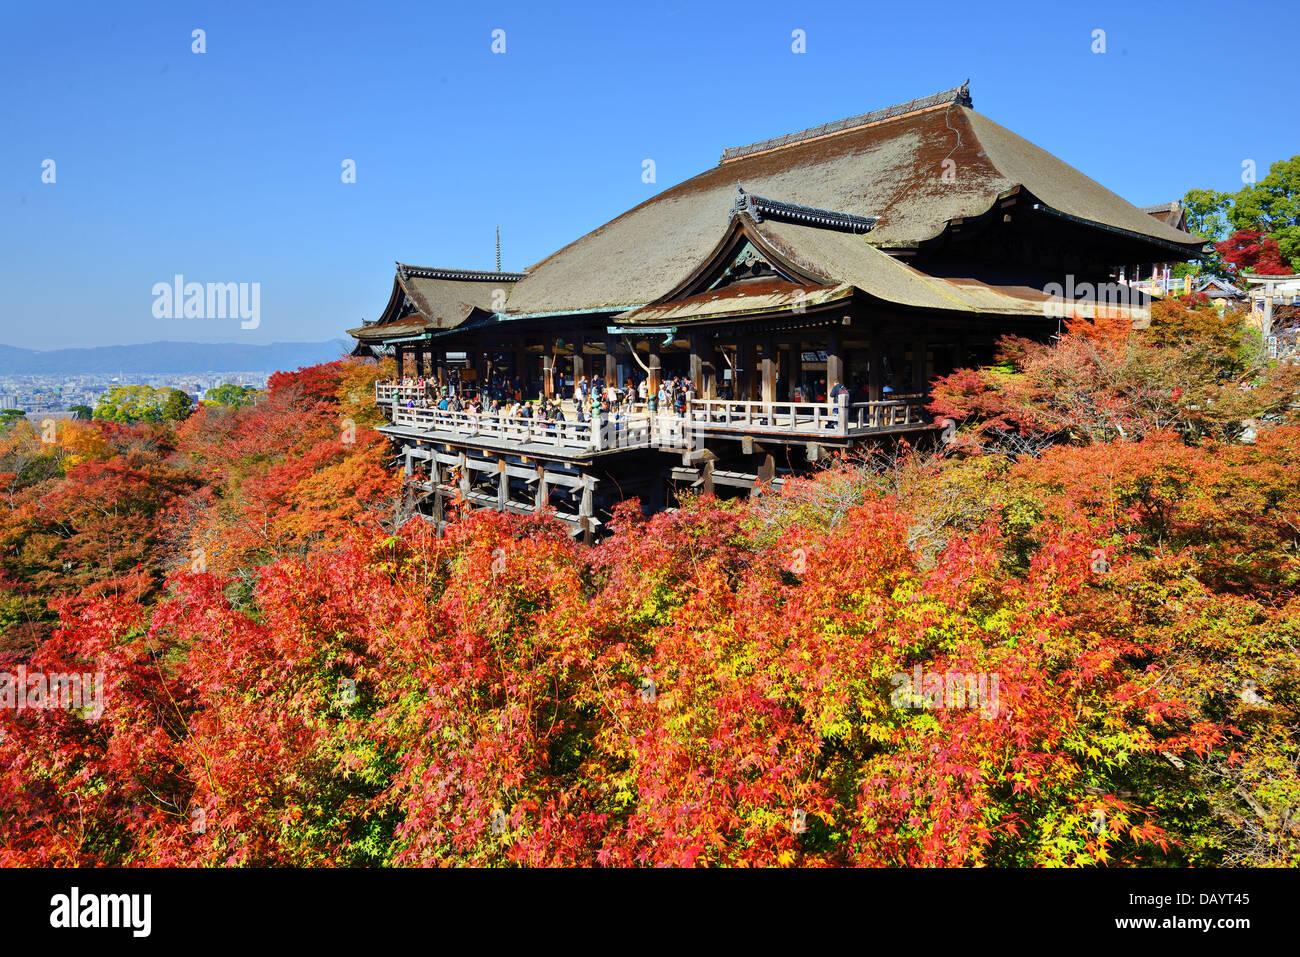 Kiyomizu-dera Temple in the autumn in Kyoto, Japan Stock Photo, Royalty Free ...